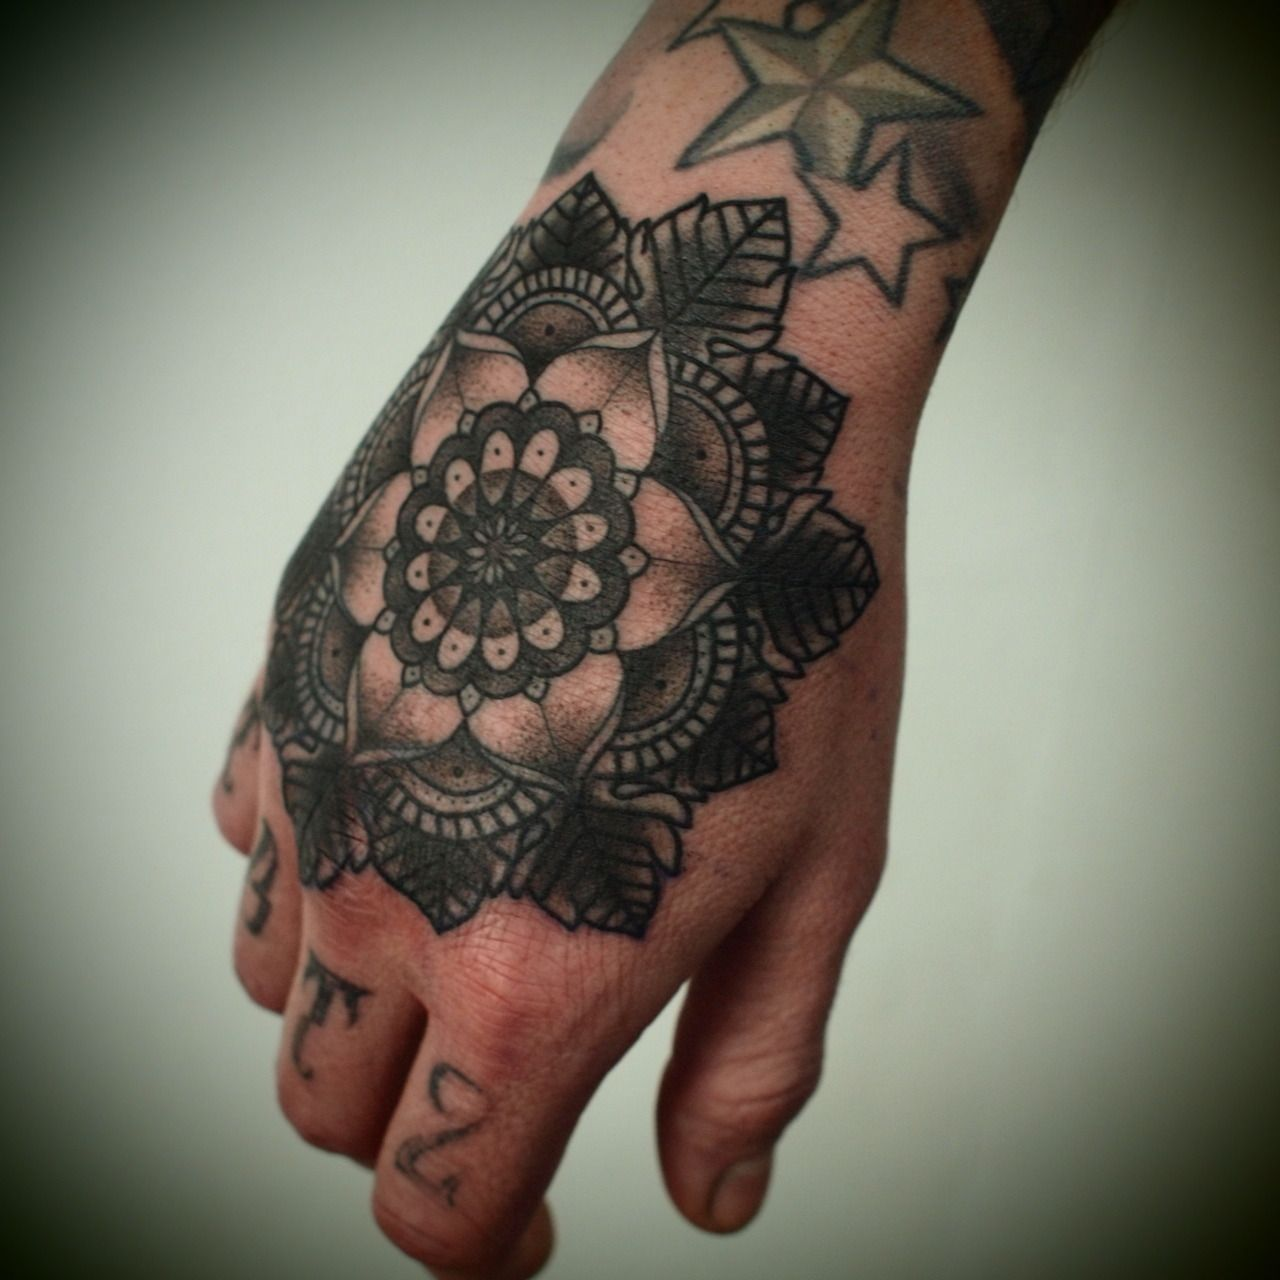 Pin By Hasel Berry On Body Art Henna Ink Geometric Flower Tattoo Mandala Hand Tattoos Body Art Tattoos